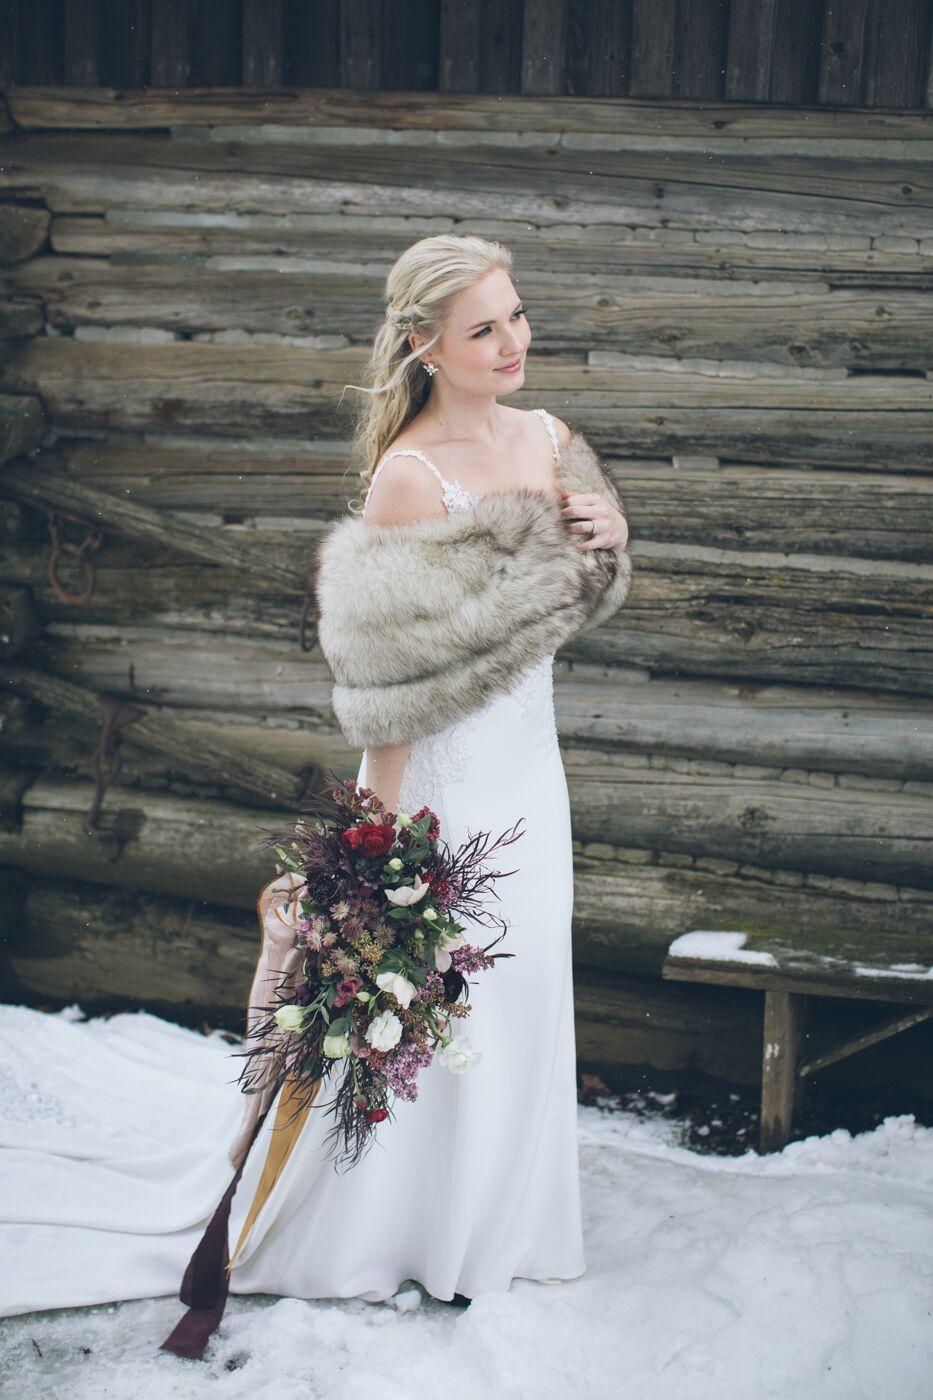 aniko-photography-mt-hood-bnb-wedding-23_preview.jpeg